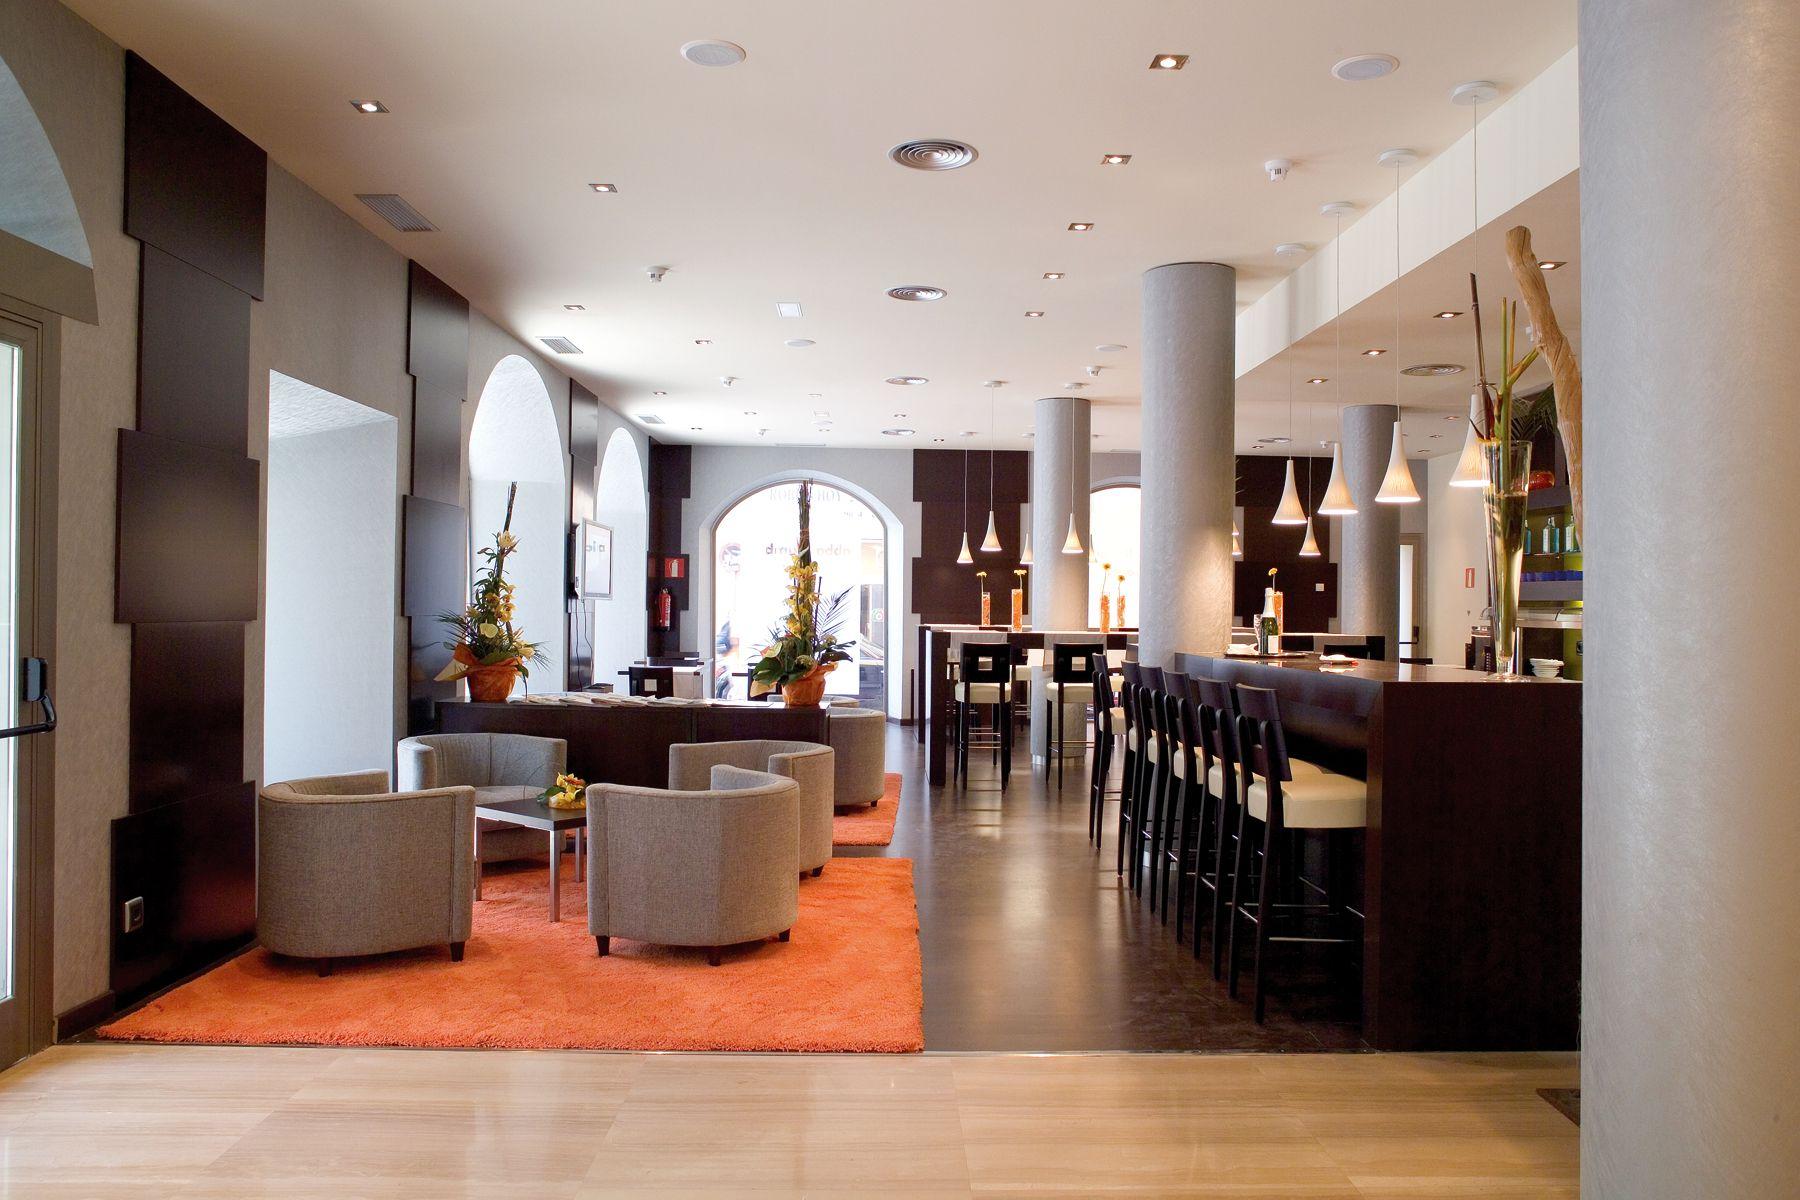 abba Rambla Hotel*** - Hotel in Barcelona - Hall